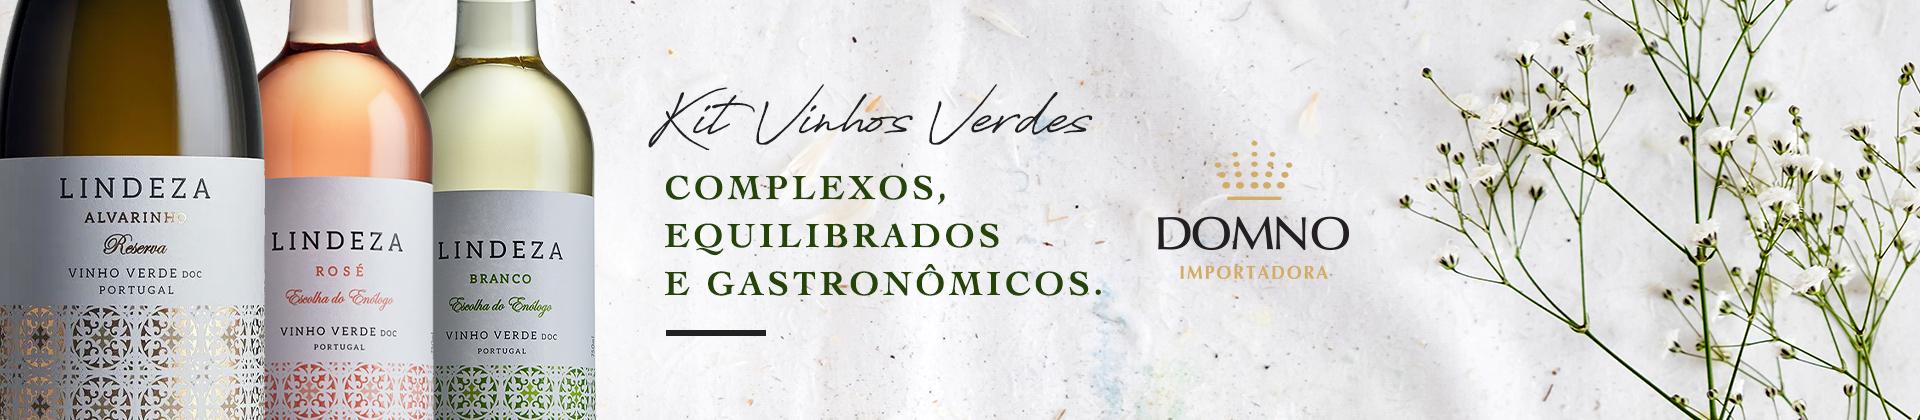 Kit Vinhos Verdes (1920x420)